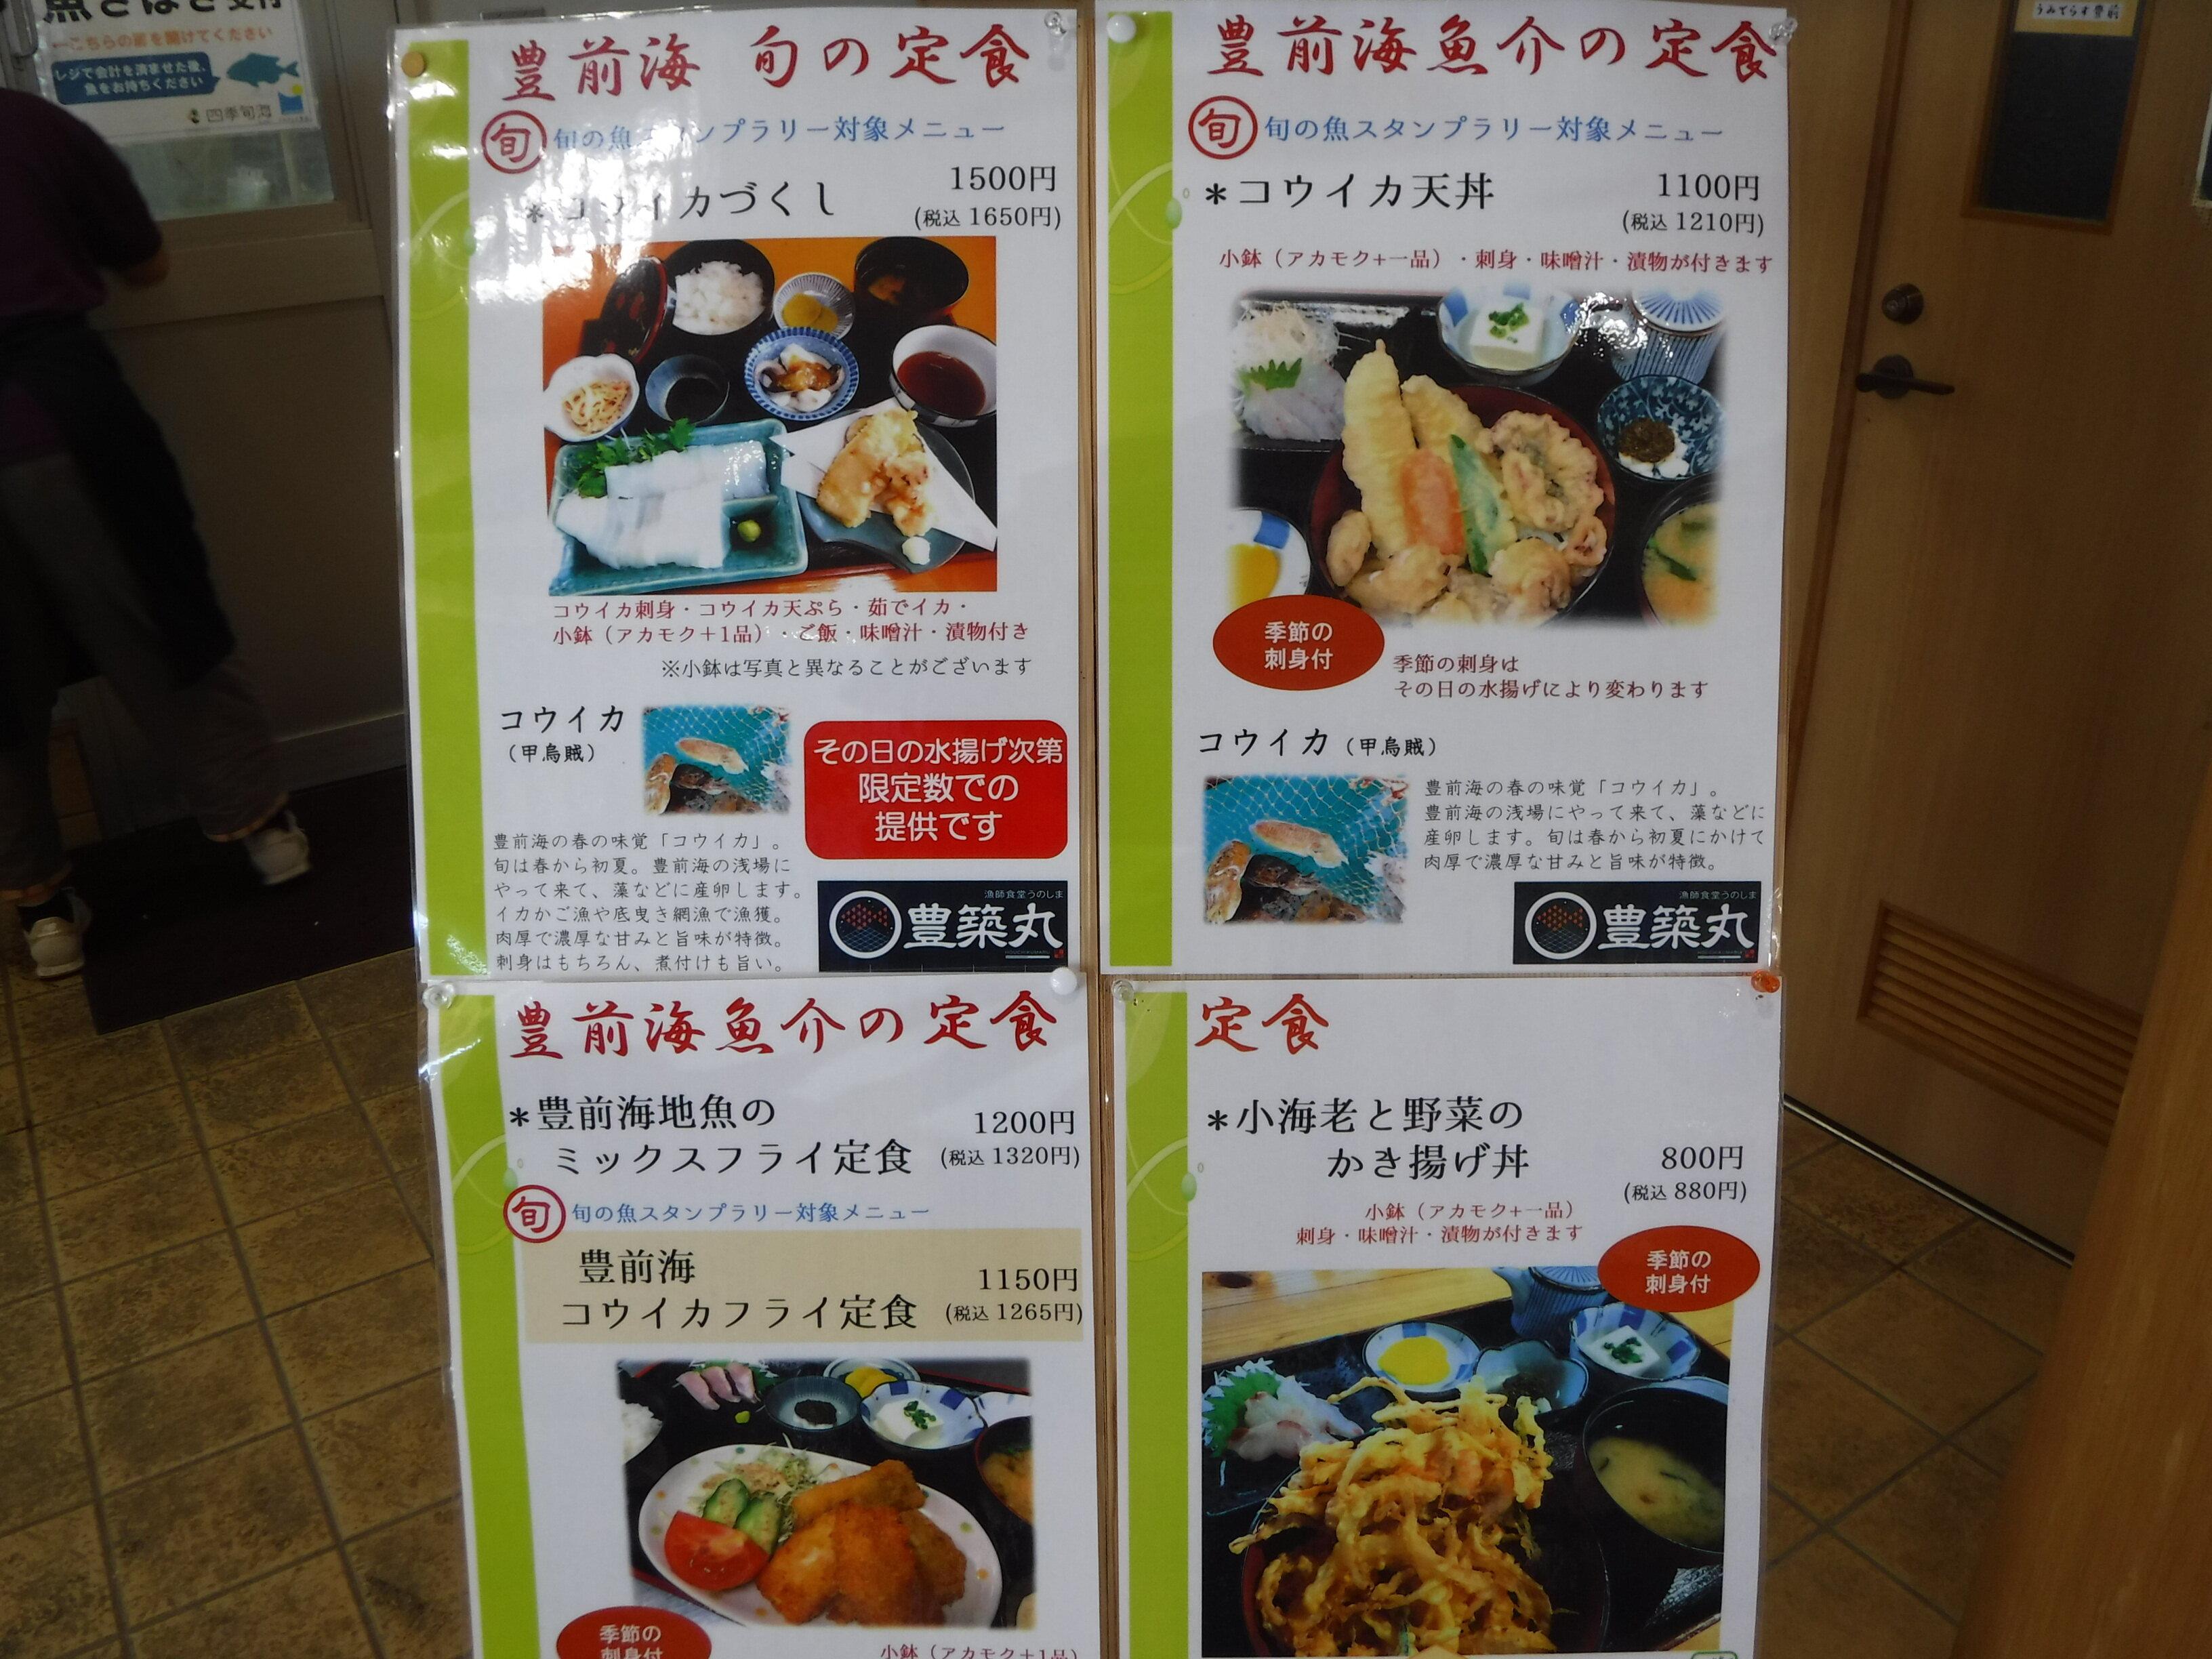 2F食堂での旬の定食メニュー